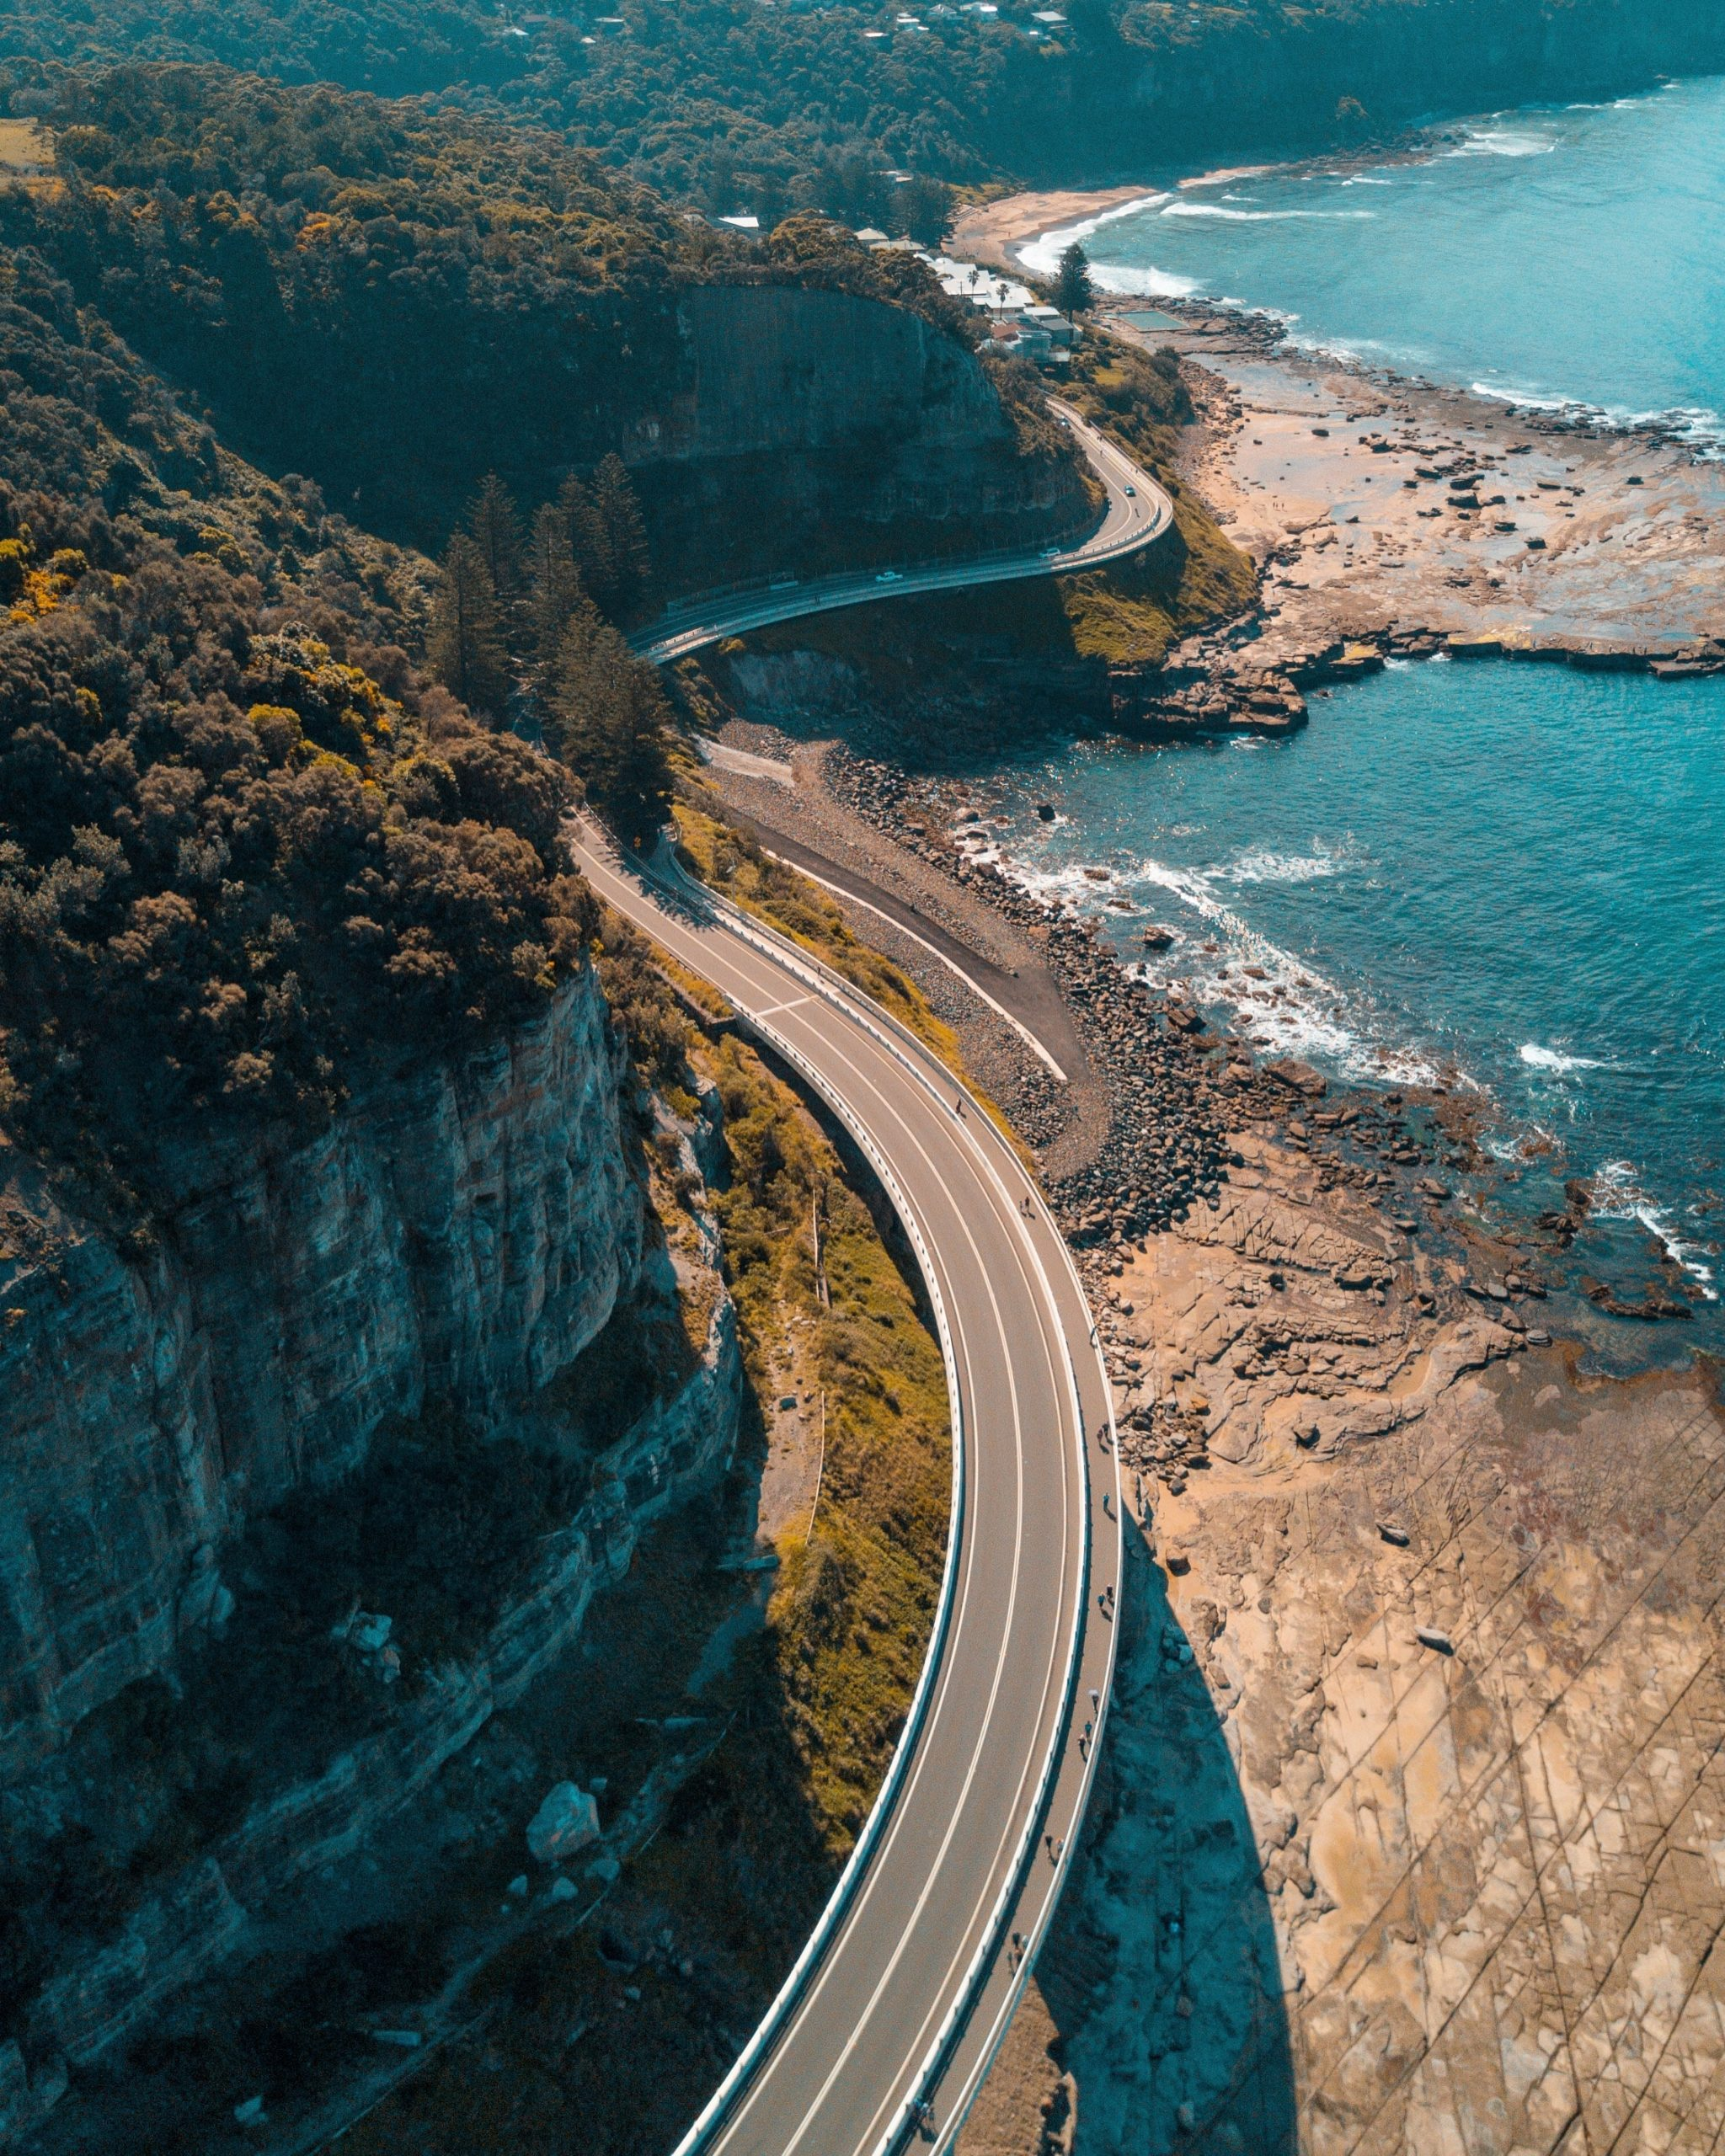 birds eye view of highway beside bay